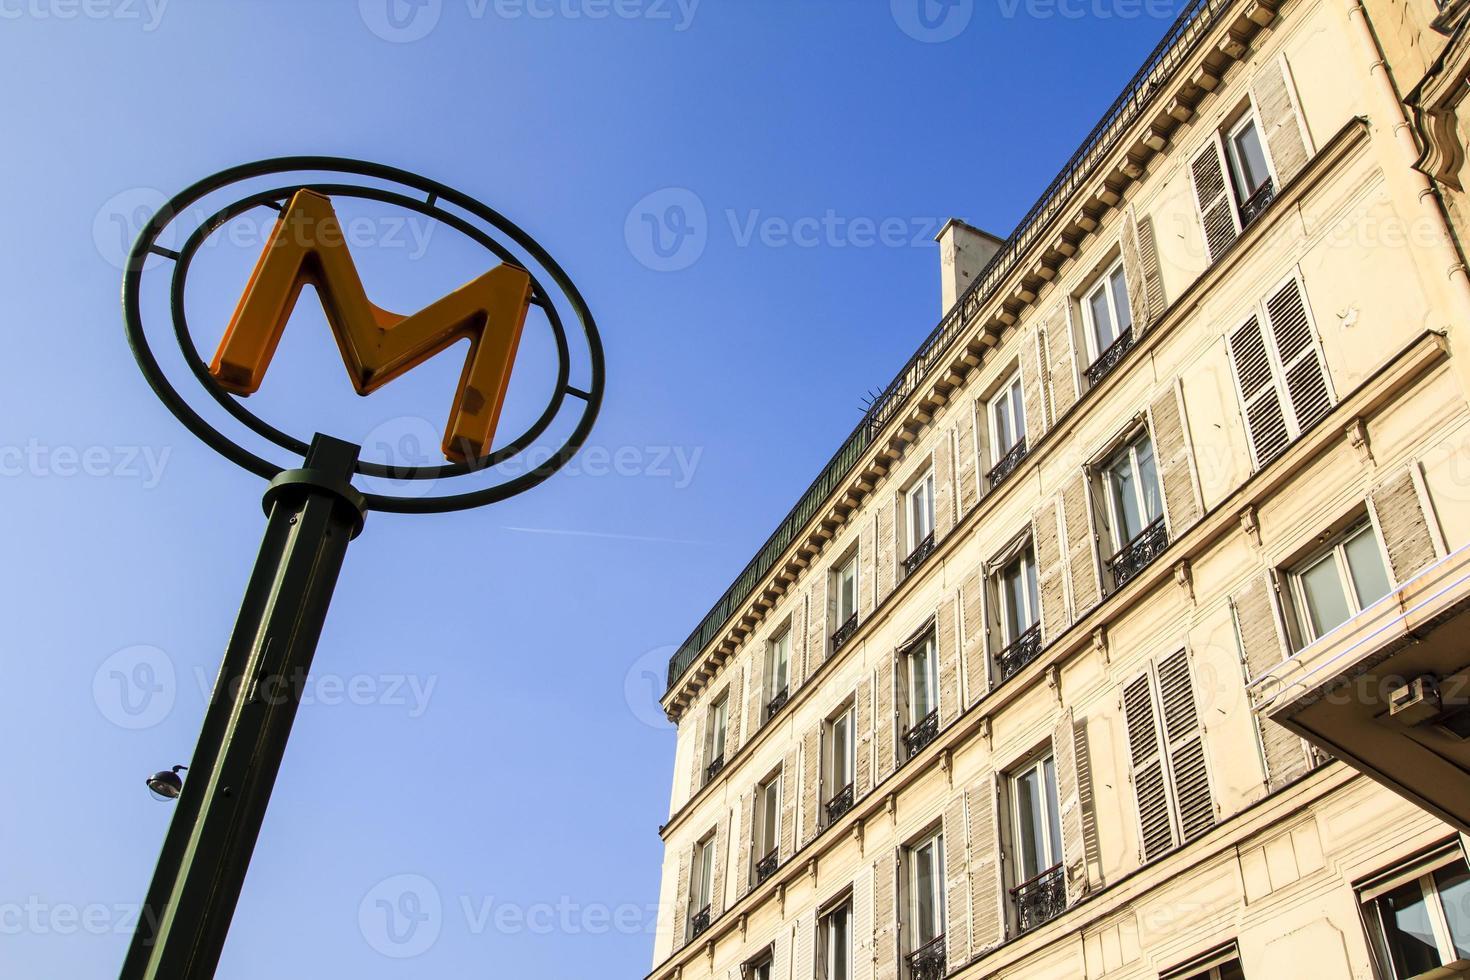 tunnelbana tecken i Paris, Frankrike foto